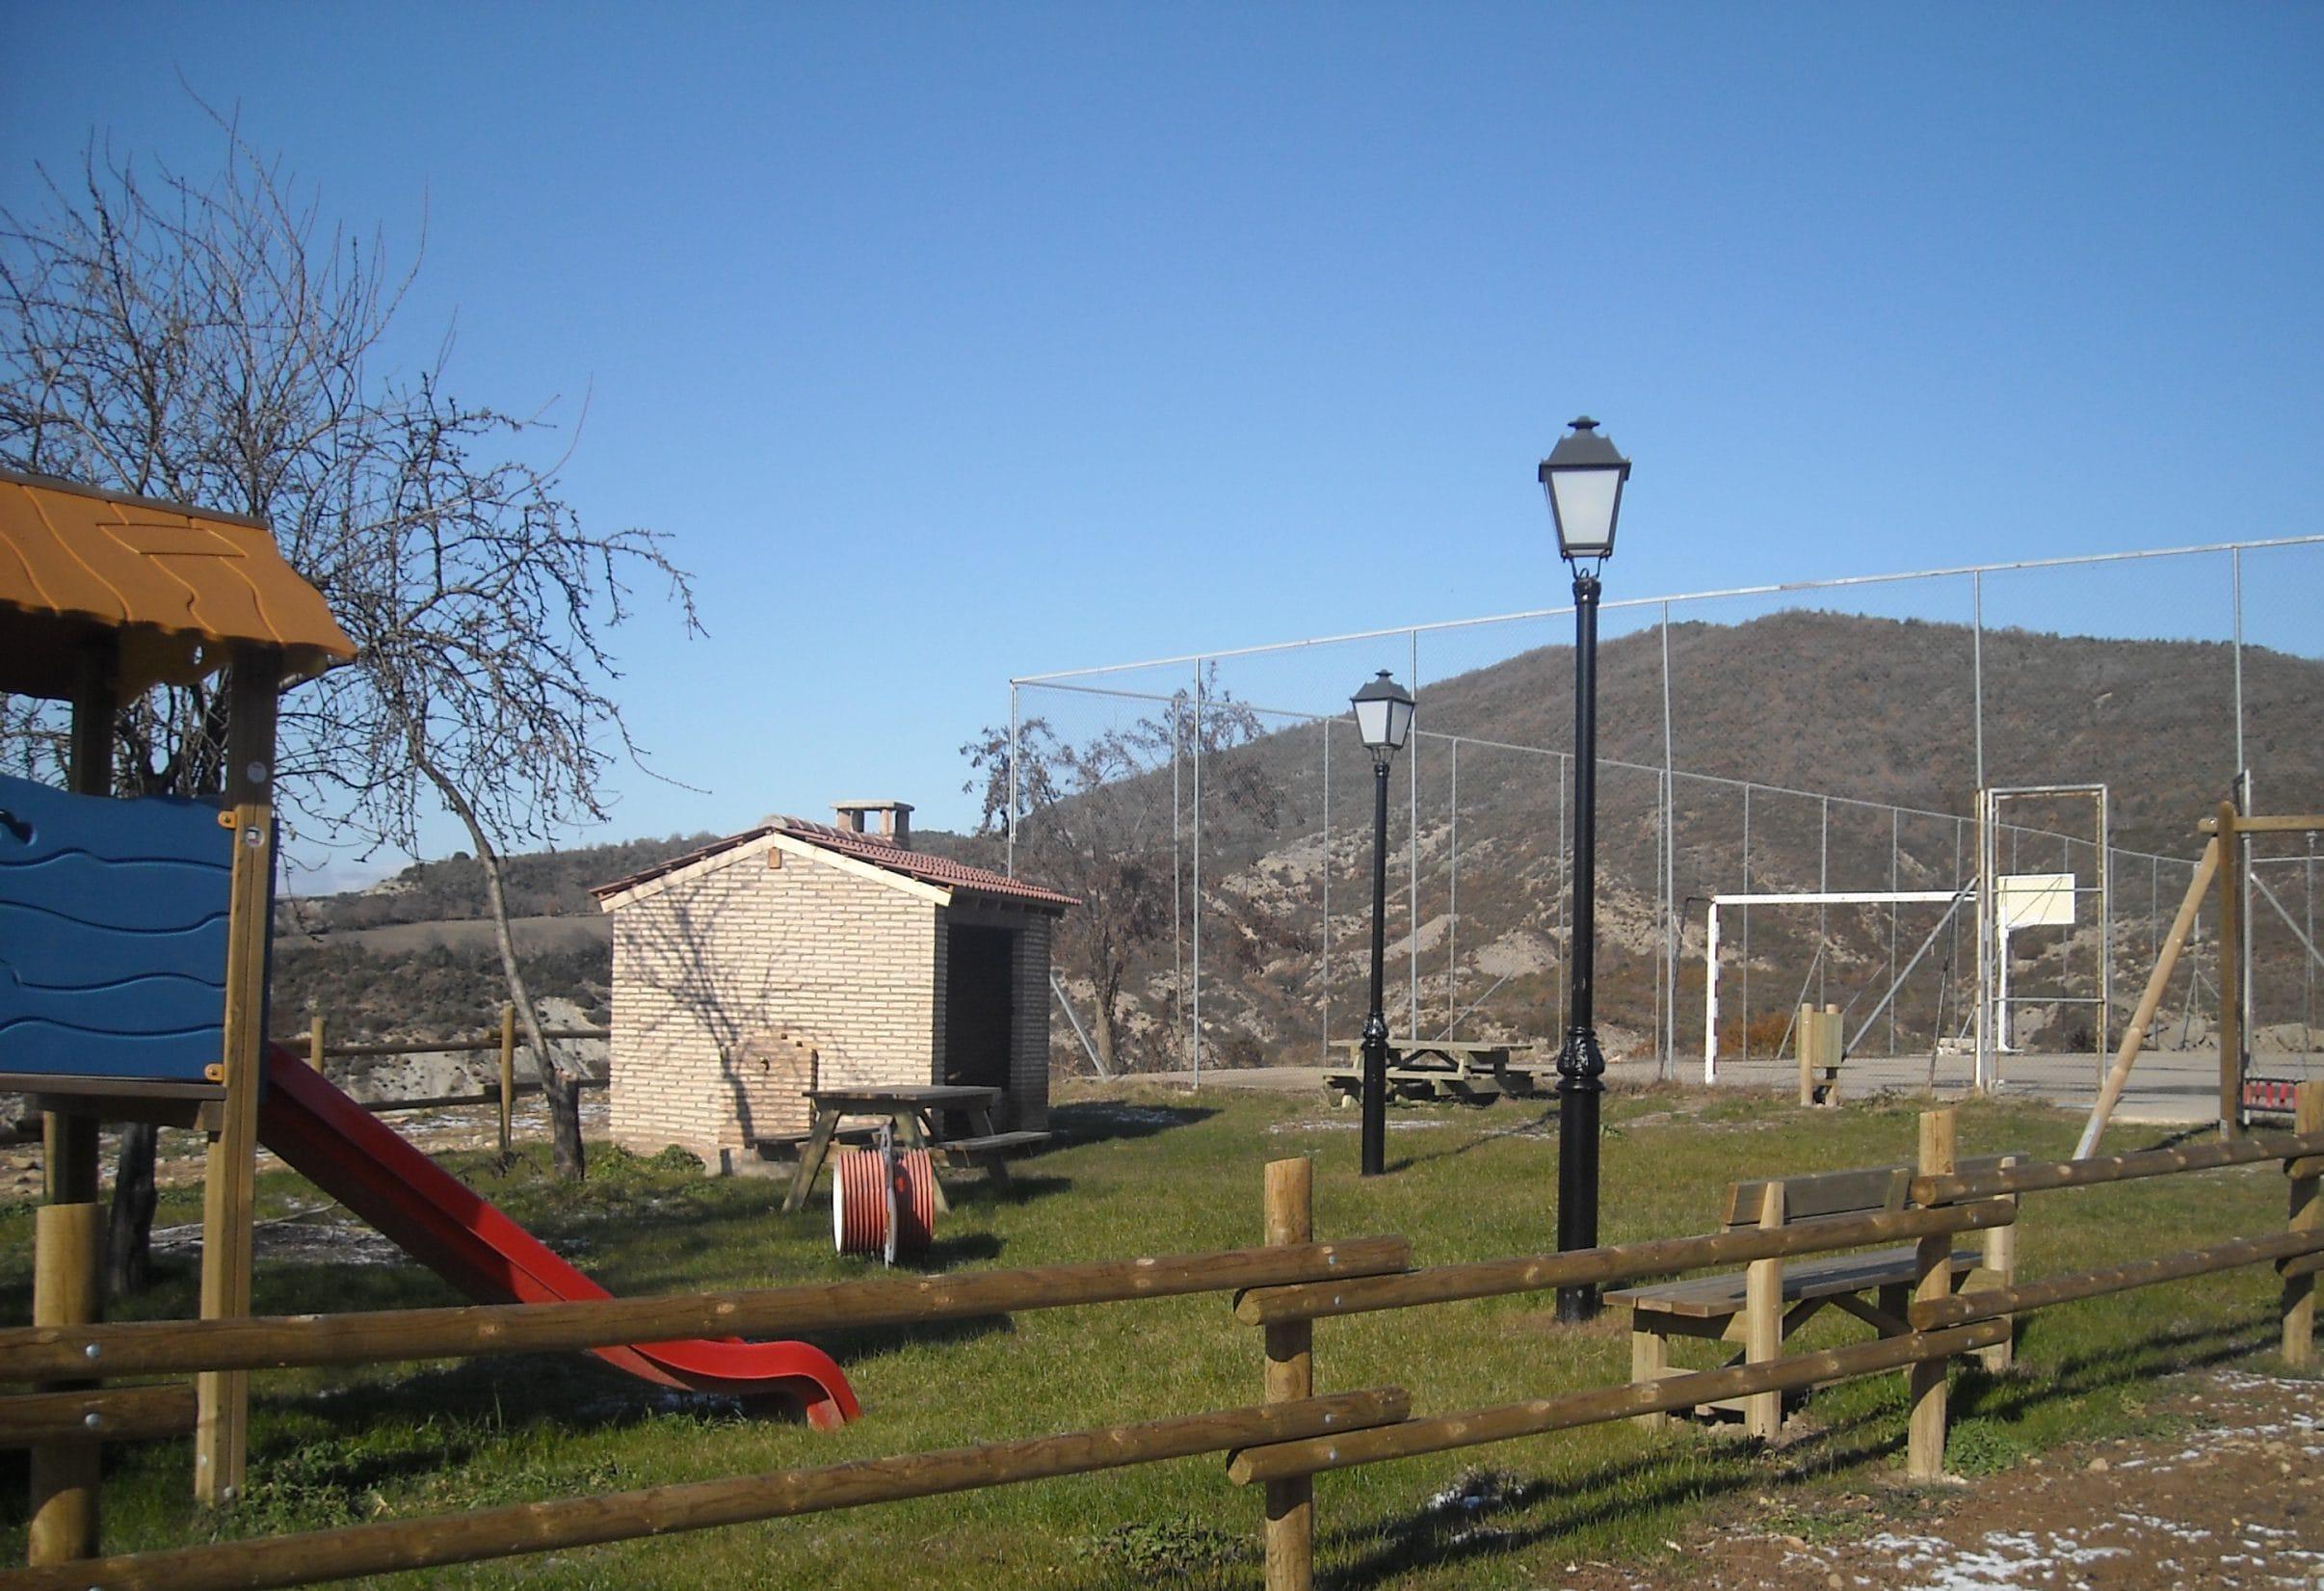 Parque infantil en Javierregay, Jaca